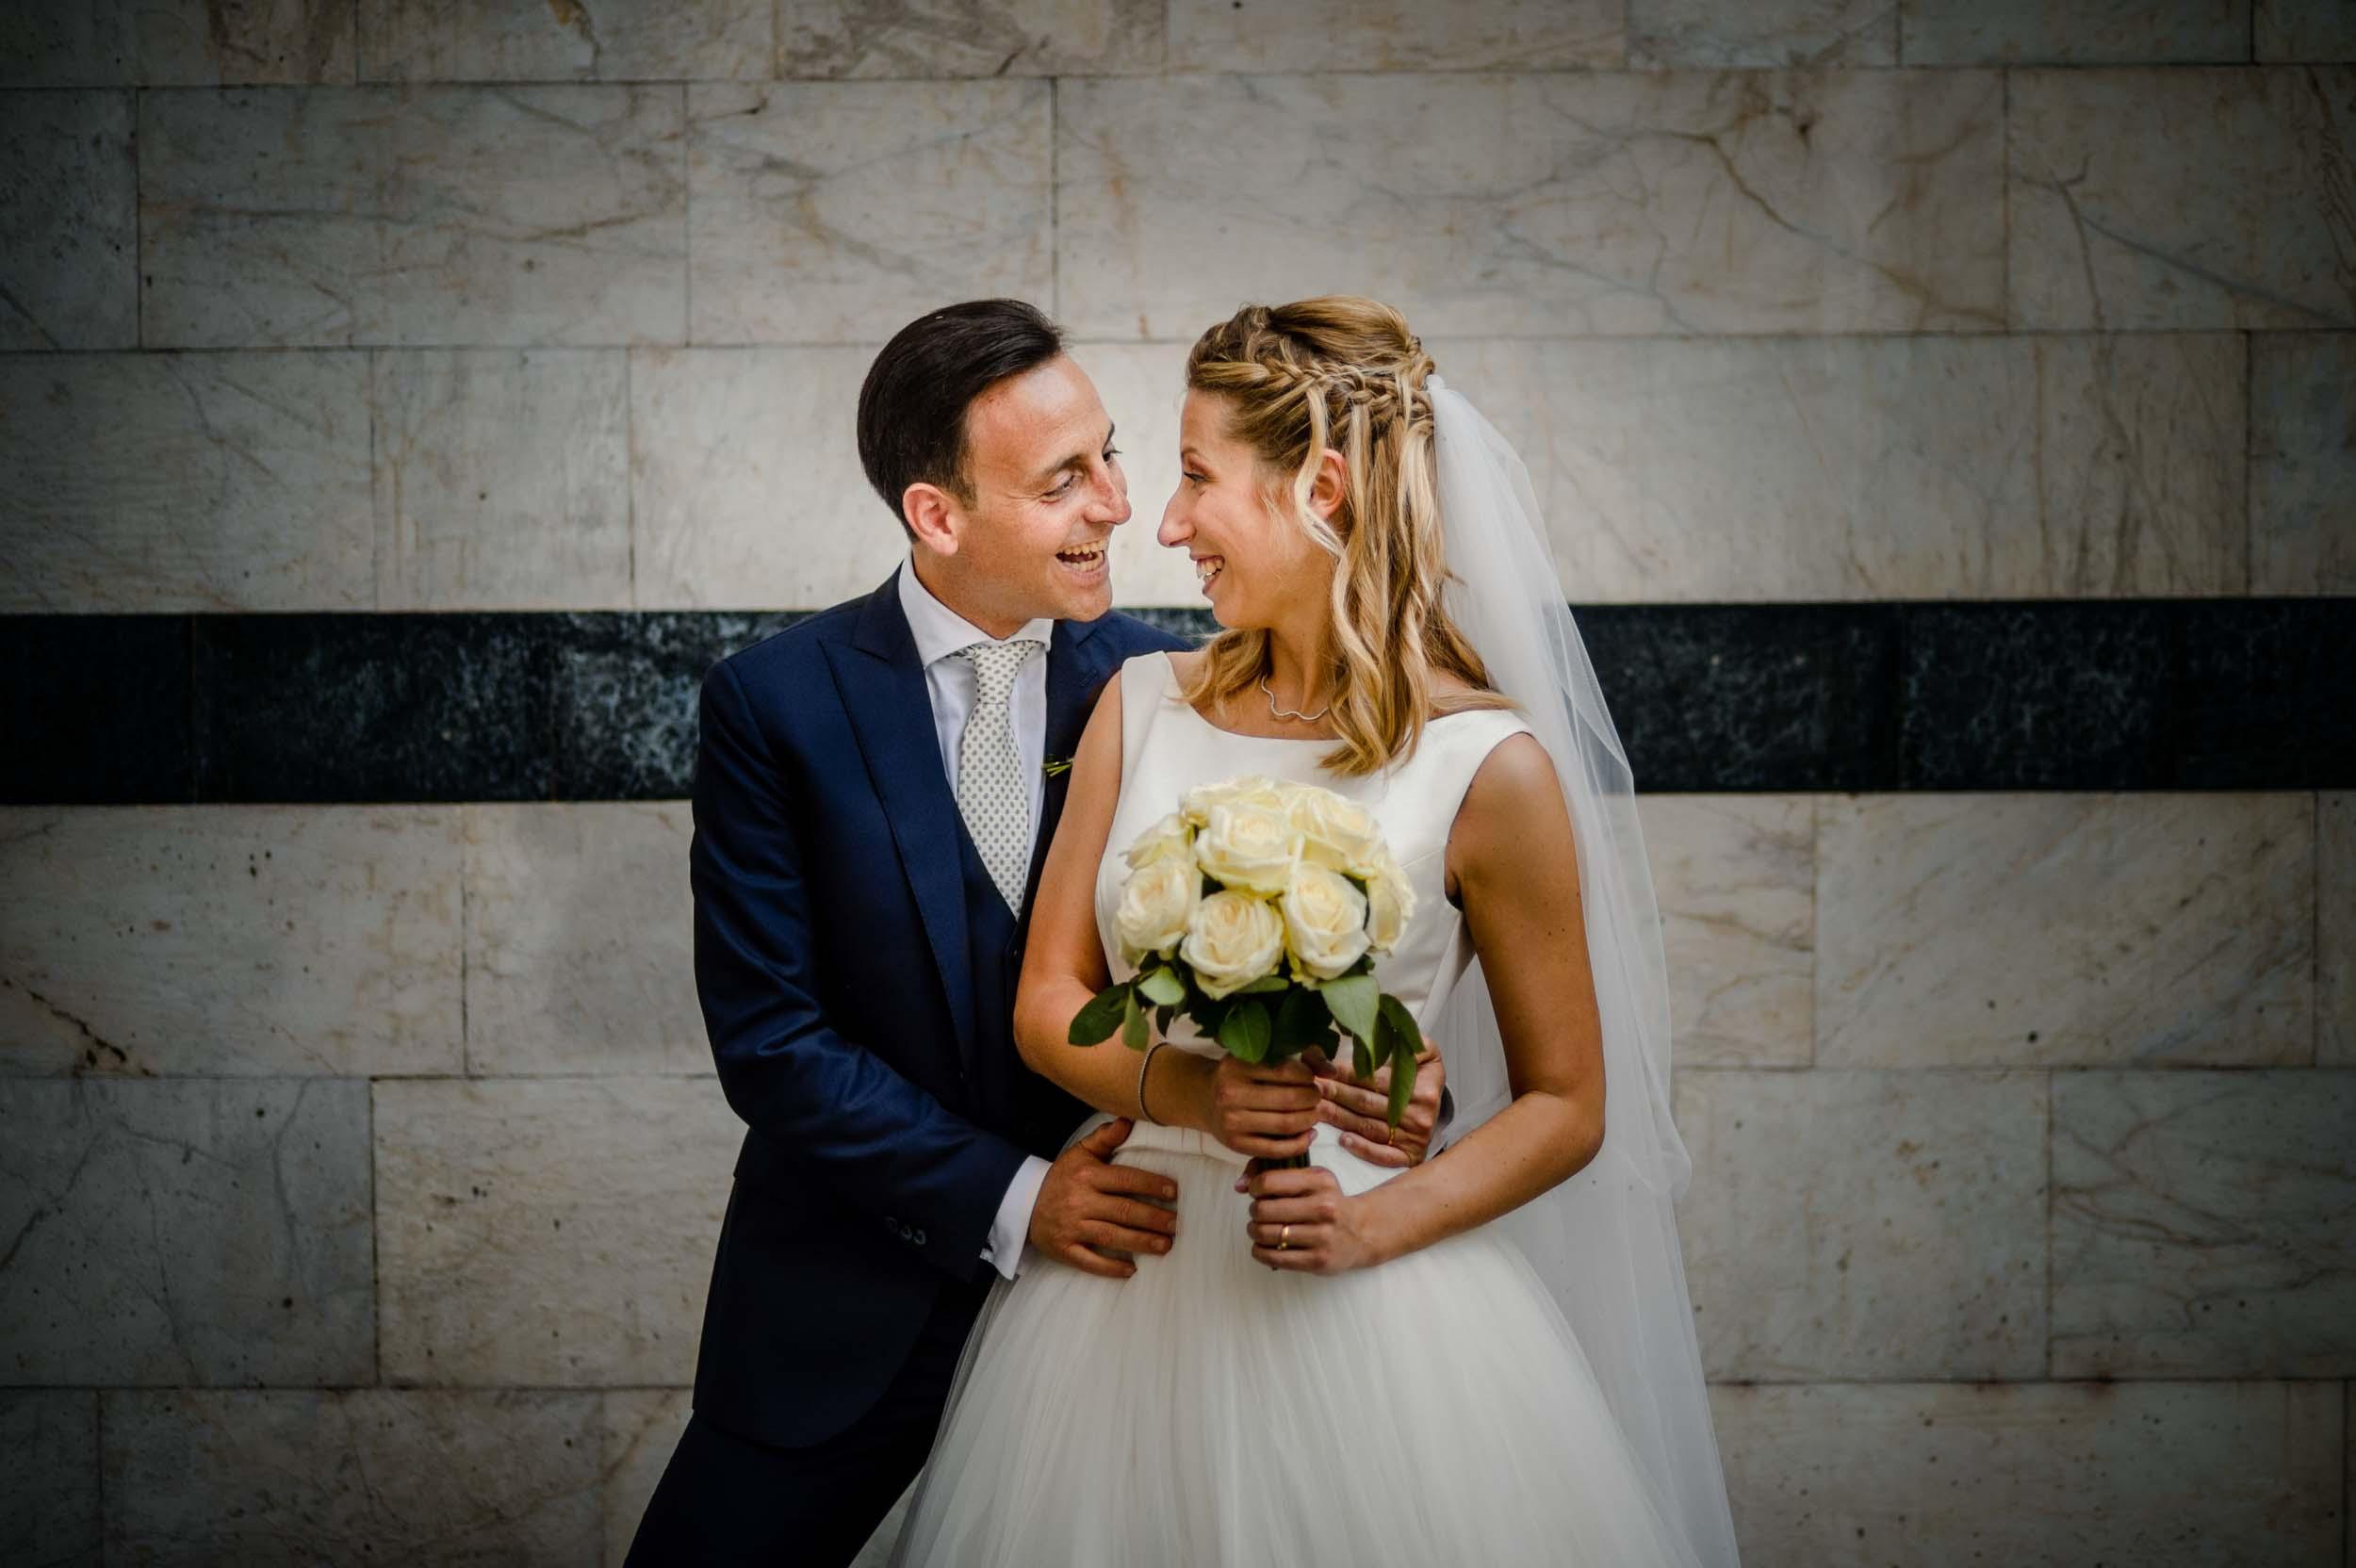 Costanza & Francesco Matrimonio a Siena, 26/5/2018